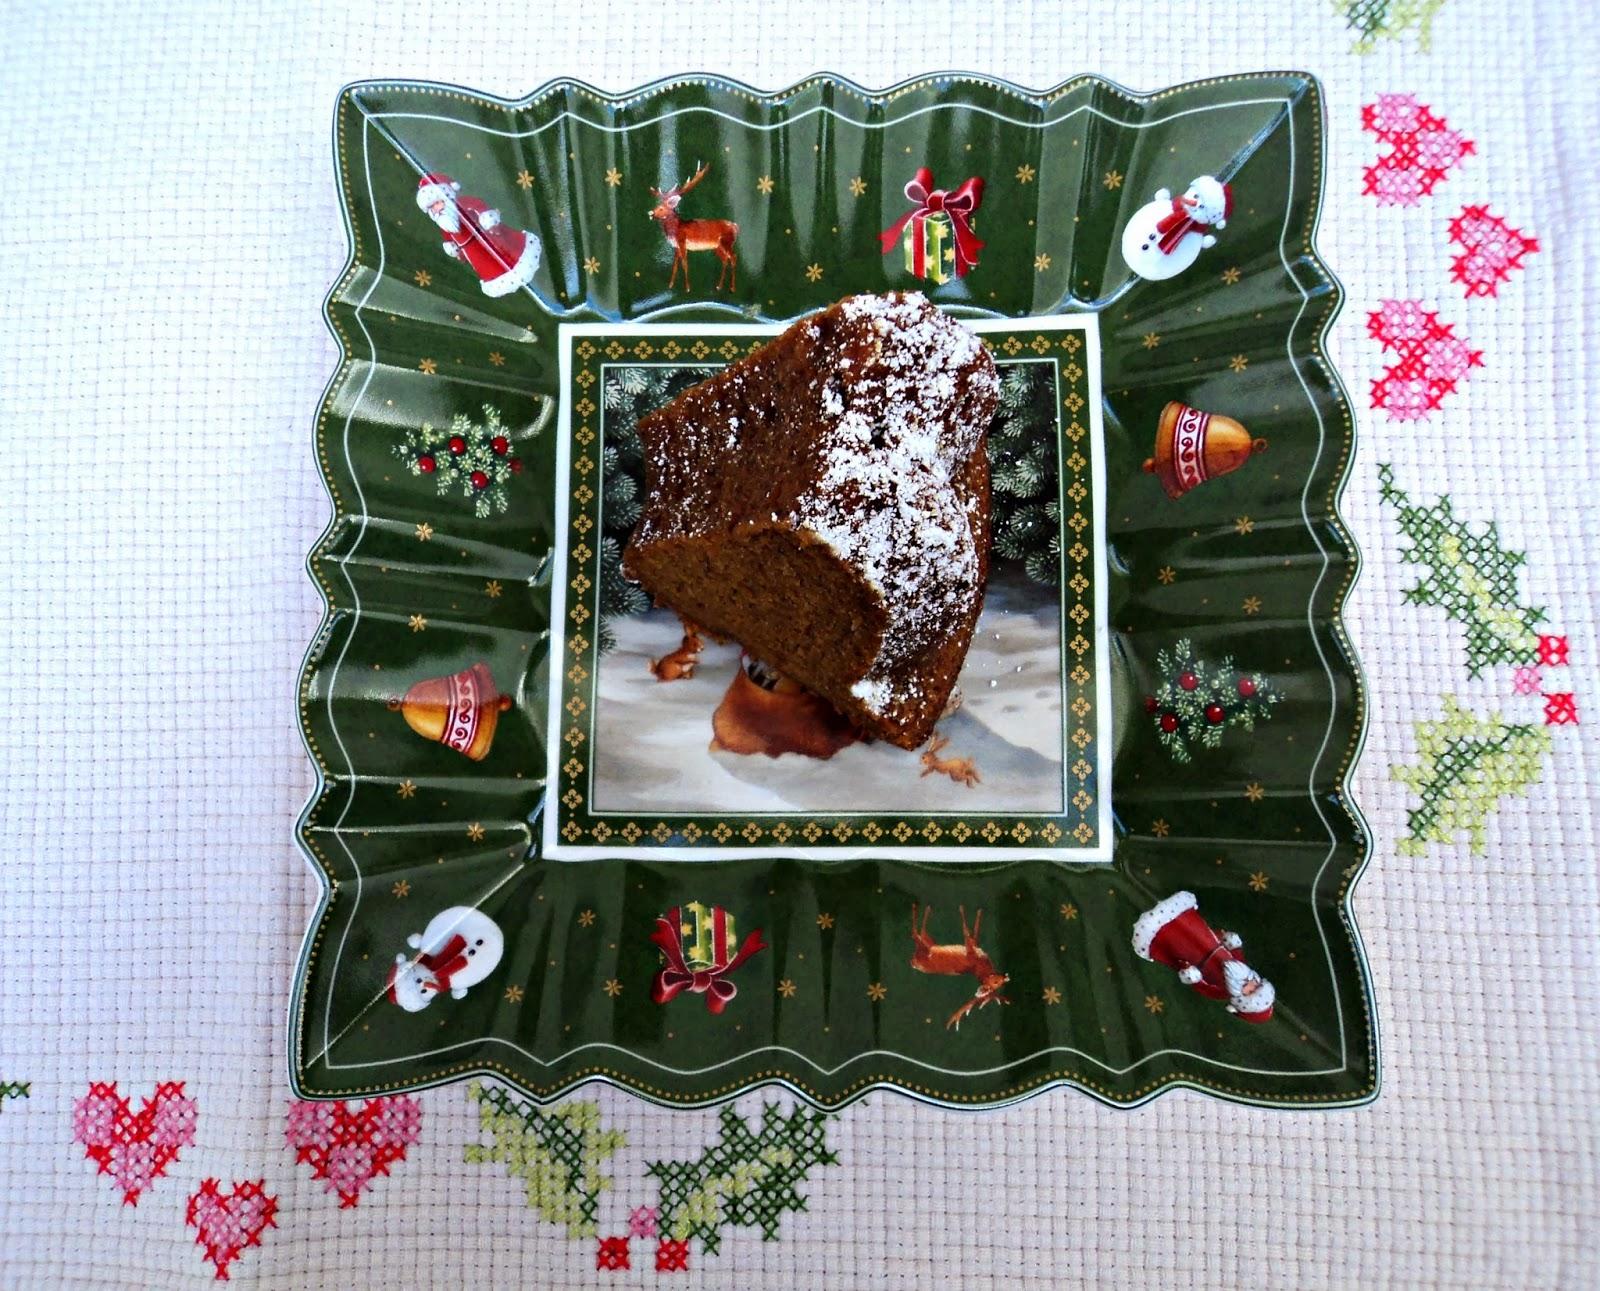 receta casera bundt cake, zanahorias, nueces